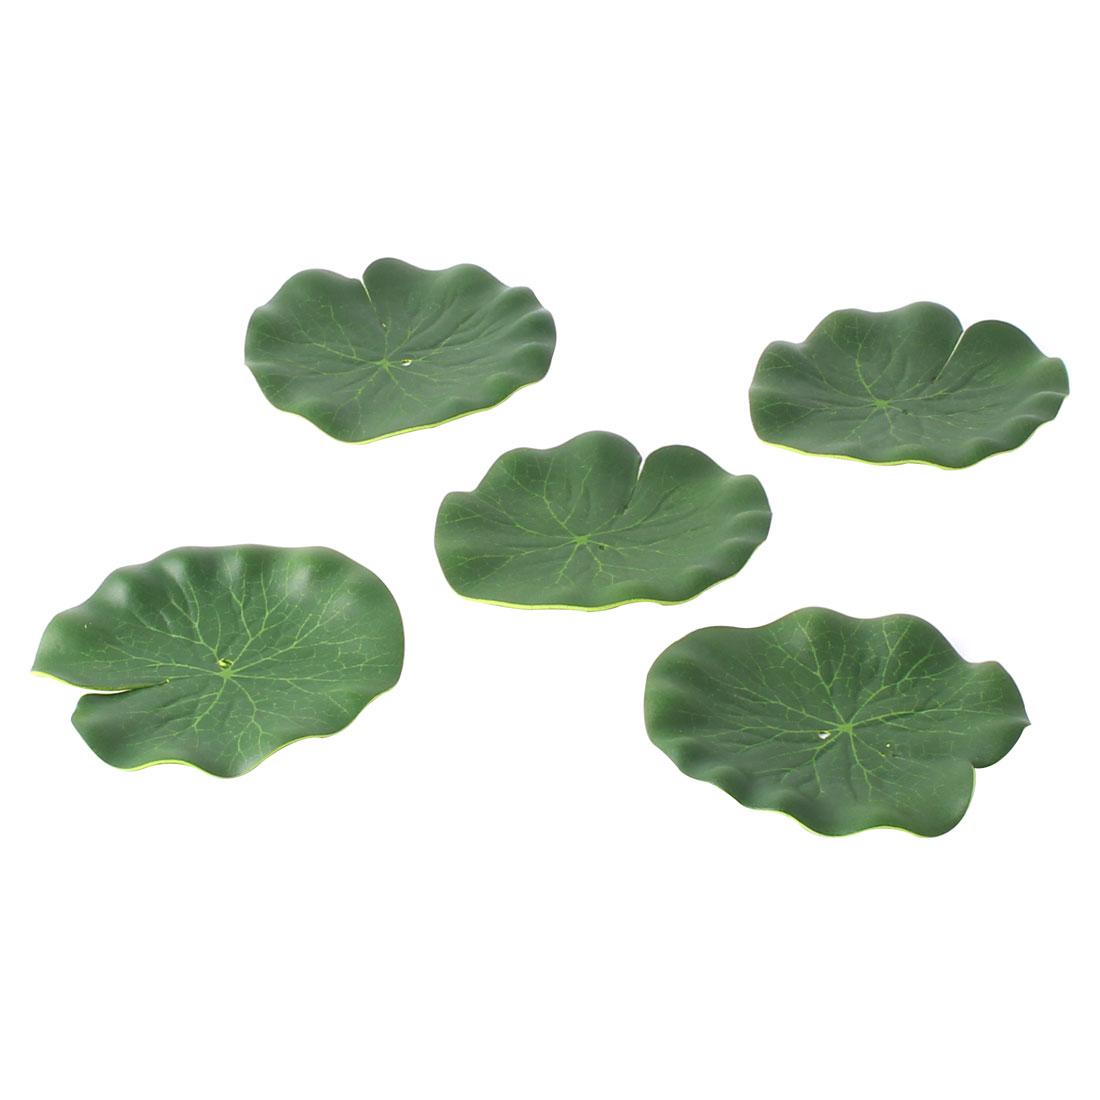 Aquarium Fish Tank Foam Lotus Leaf Water Plant Grass Floating Decoration Green 5Pcs